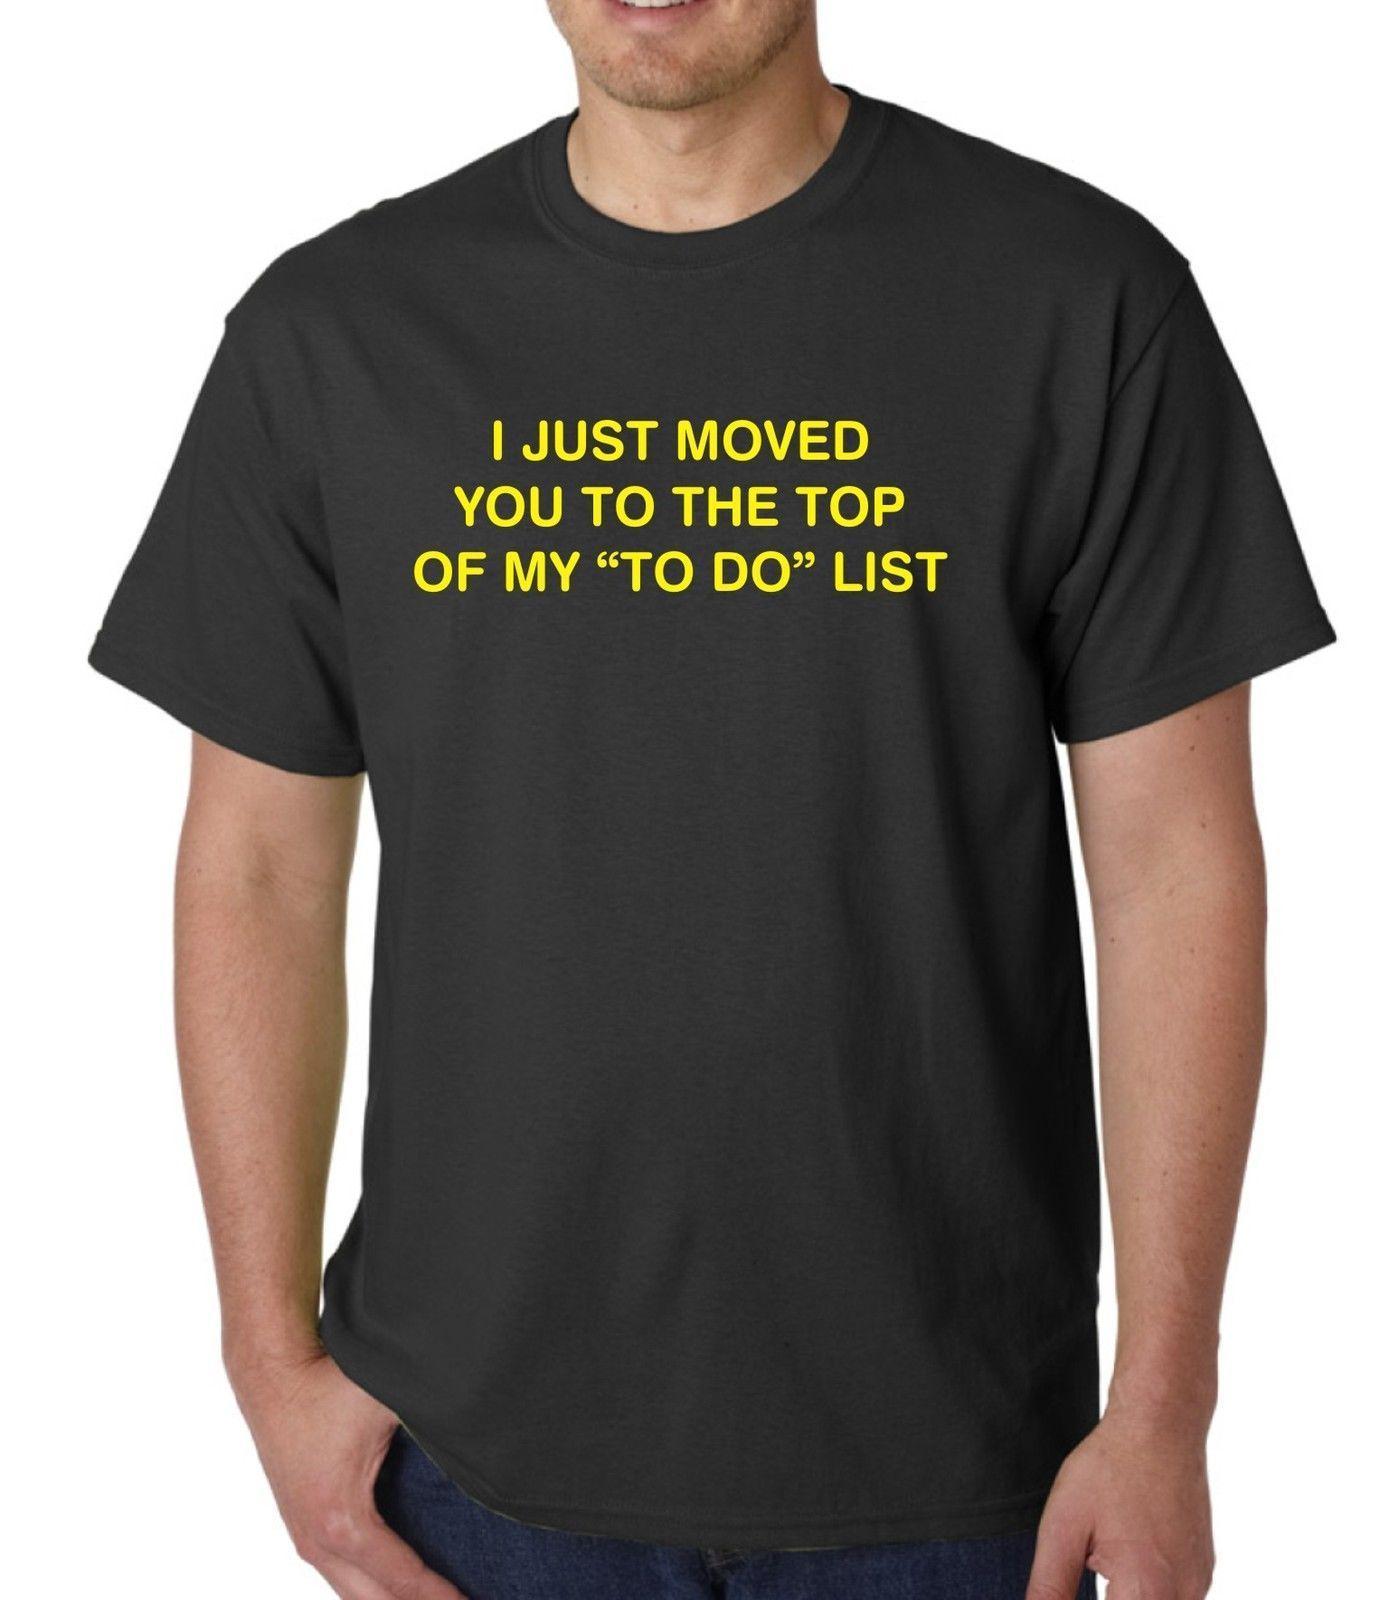 a88a7730c9d6a i just moved you to the top of my to do list t shirt hoody various colours  Mens 2018 fashion Brand T Shirt O-Neck 100%cotton T-Shirt